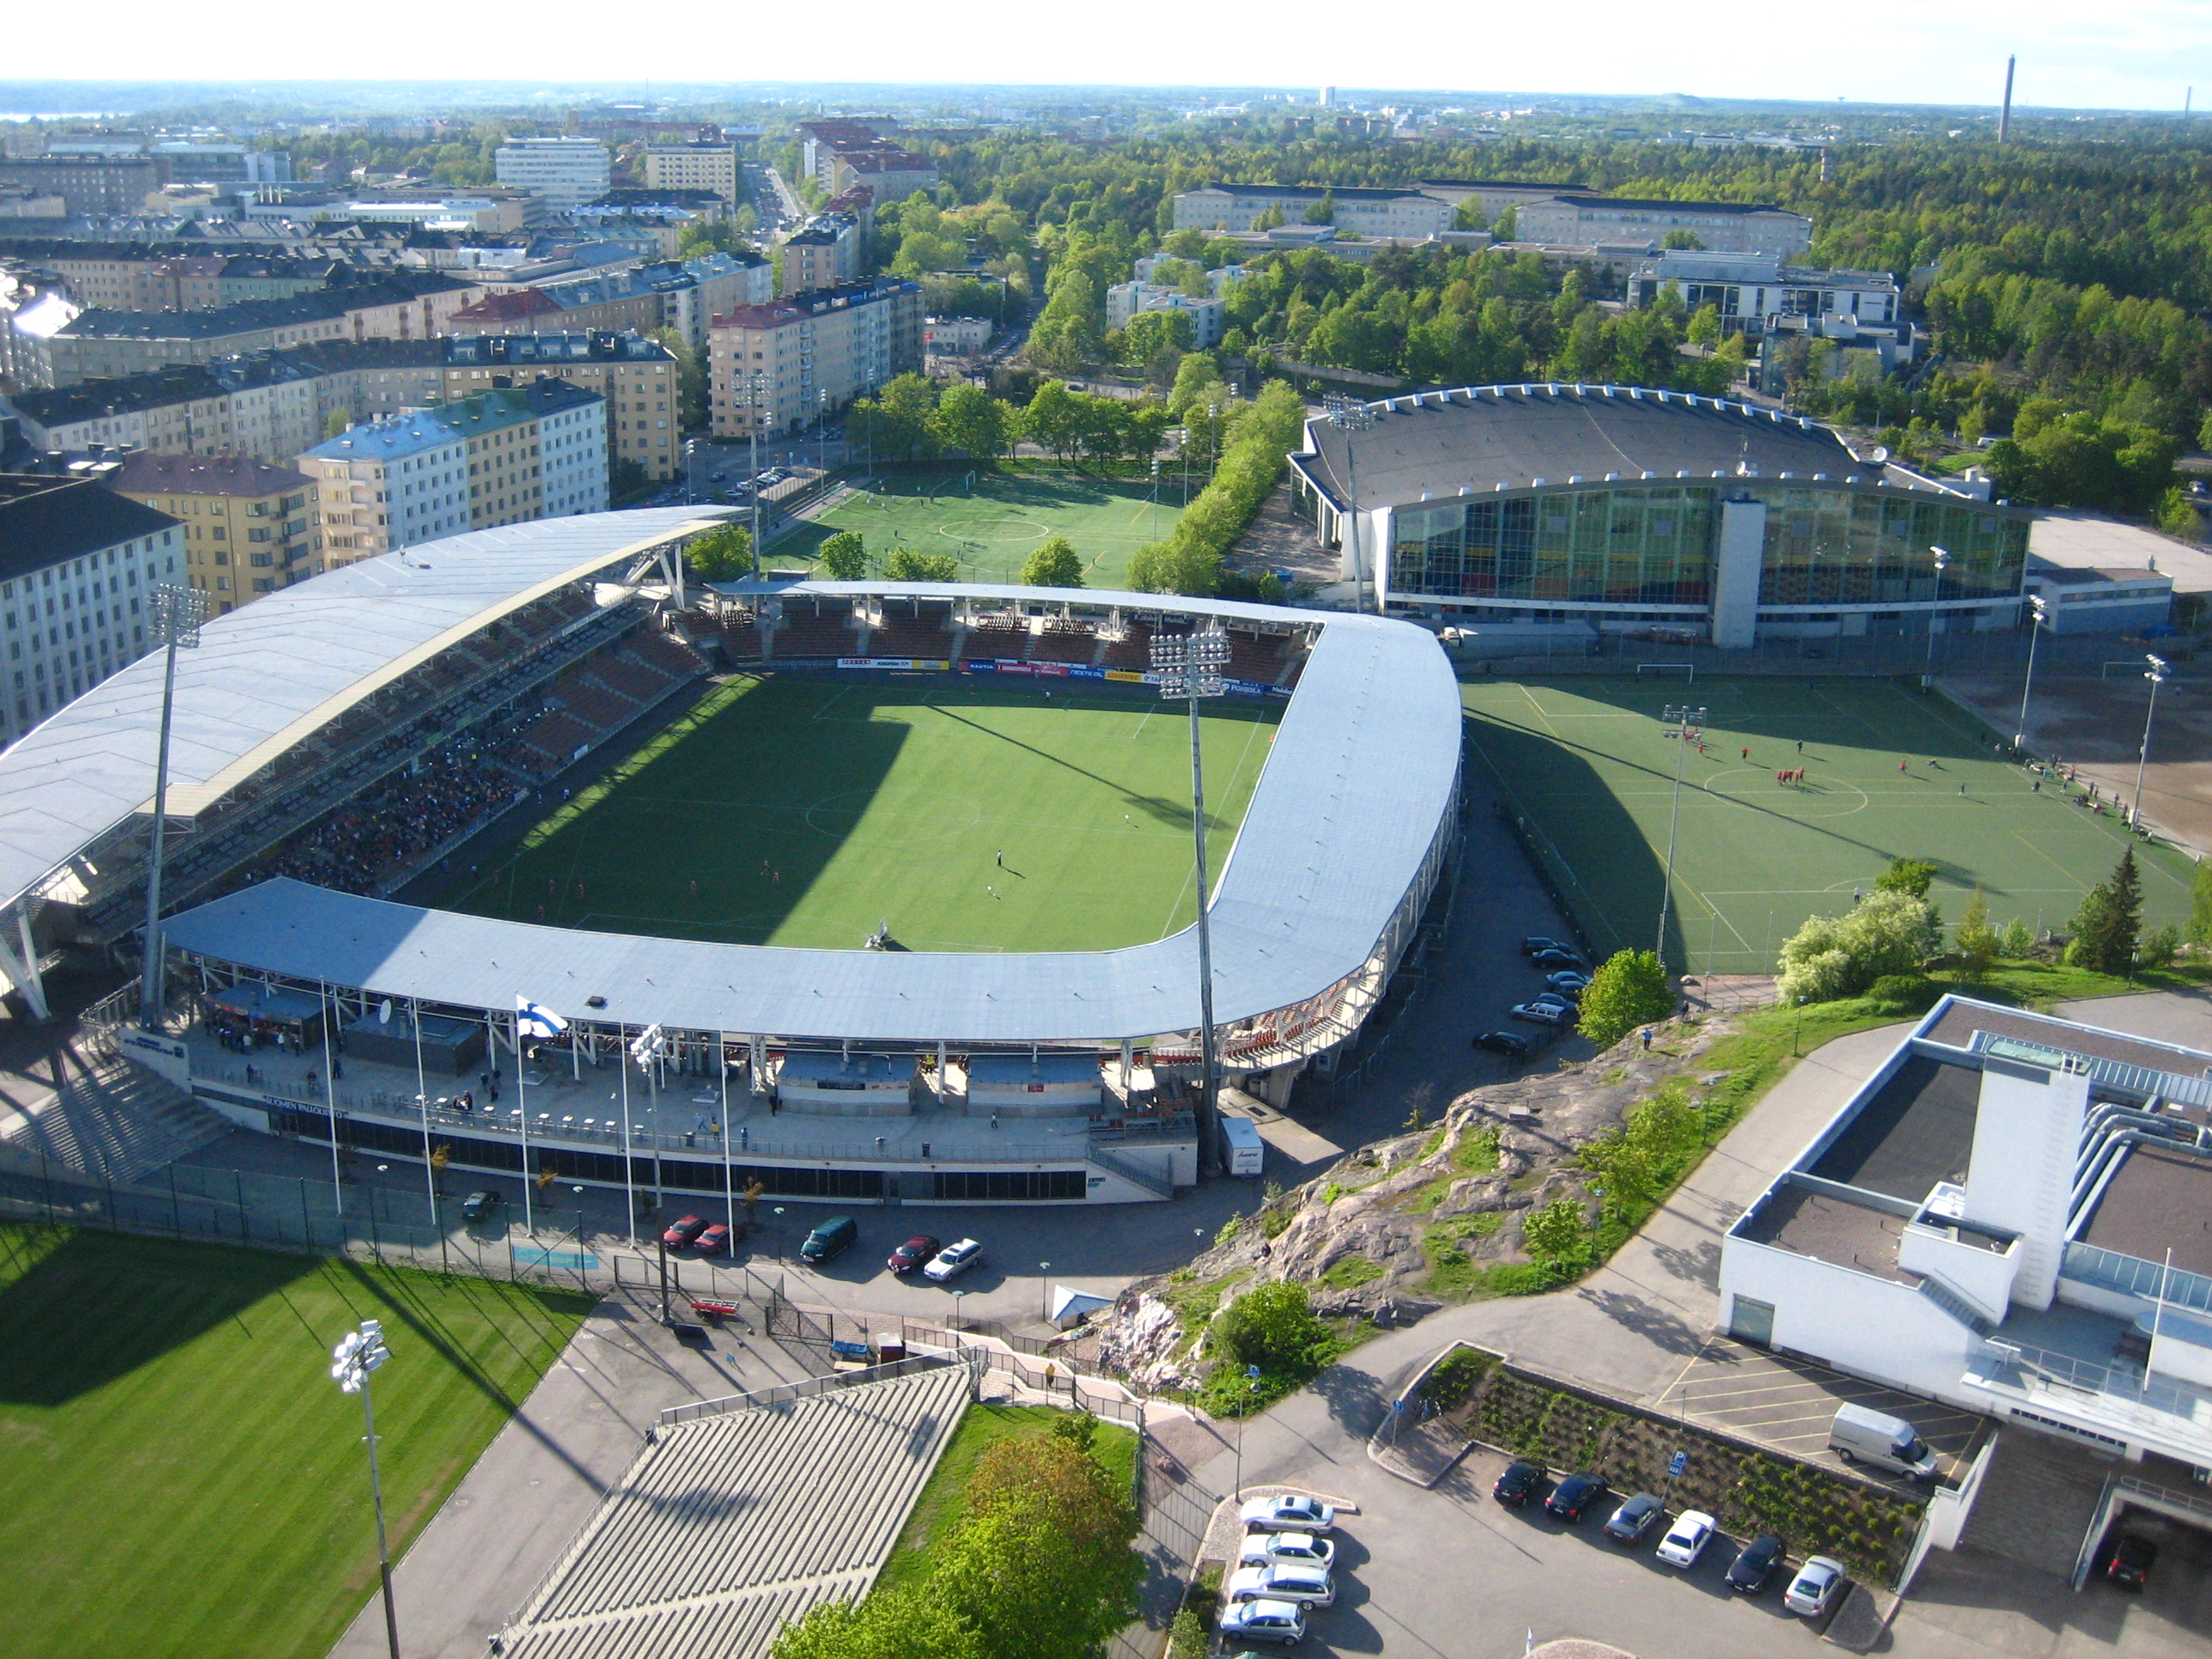 Nordis Helsinki